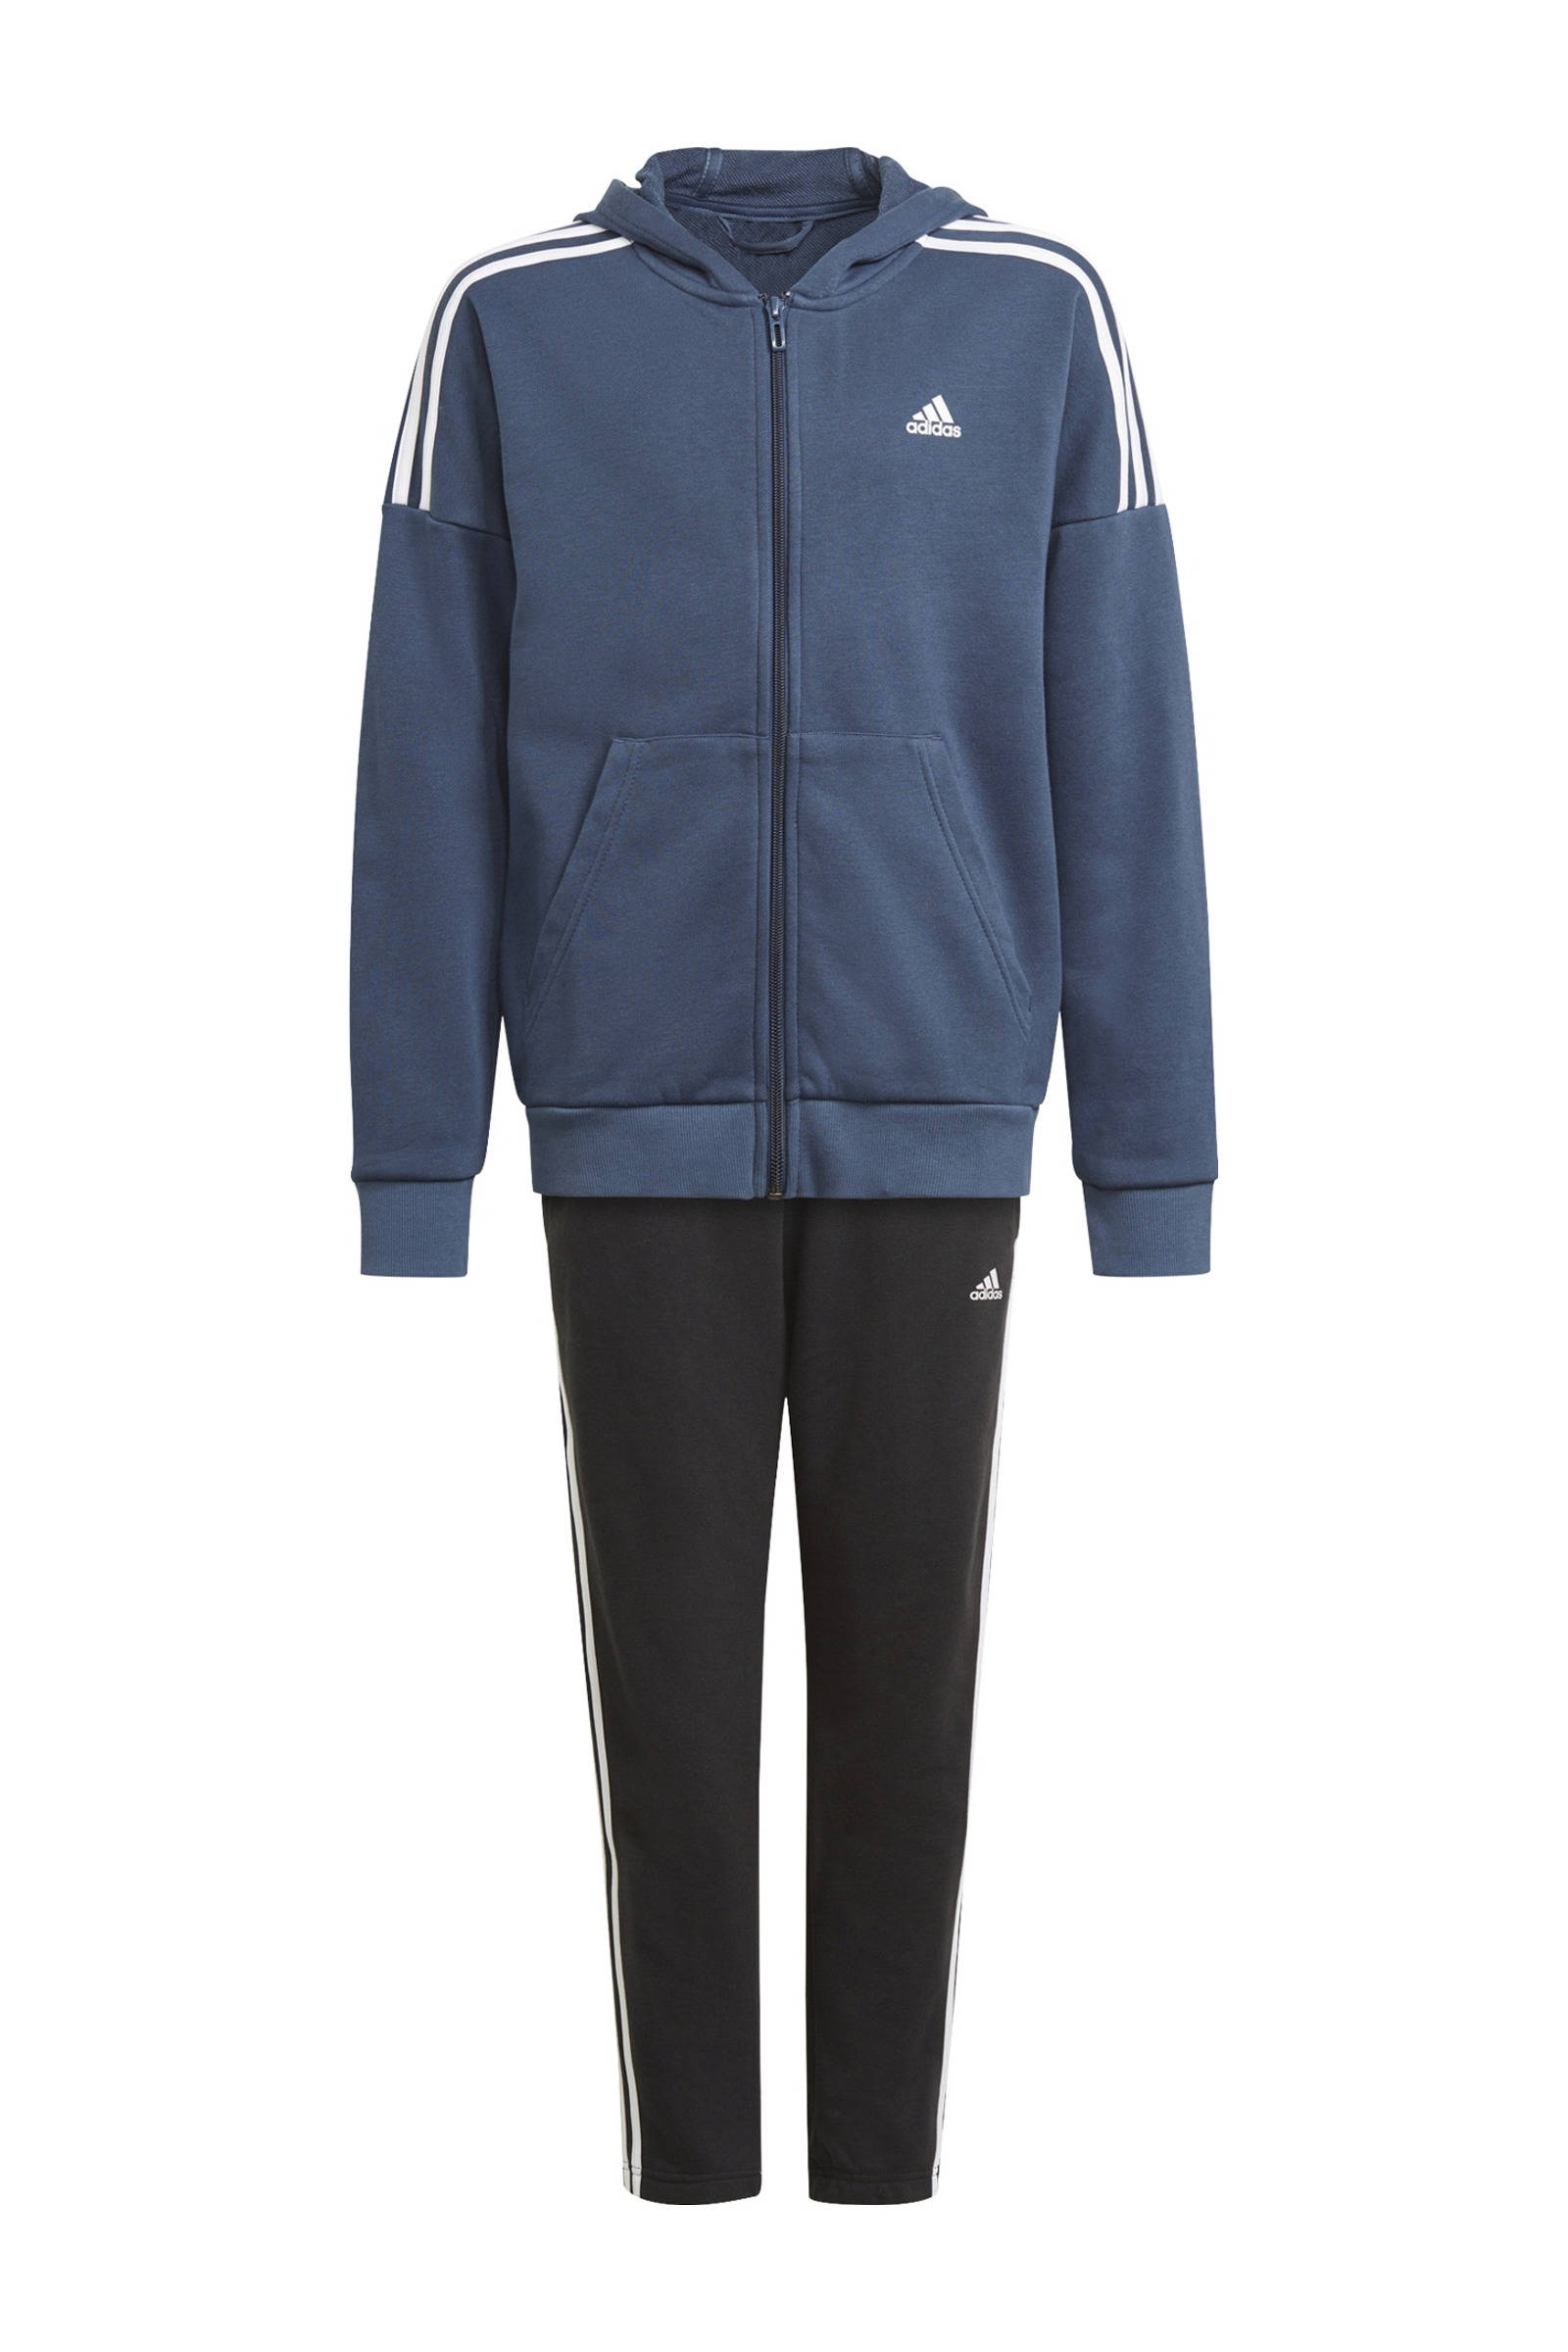 Adidas Performance trainingspak donkerblauw/zwart online kopen